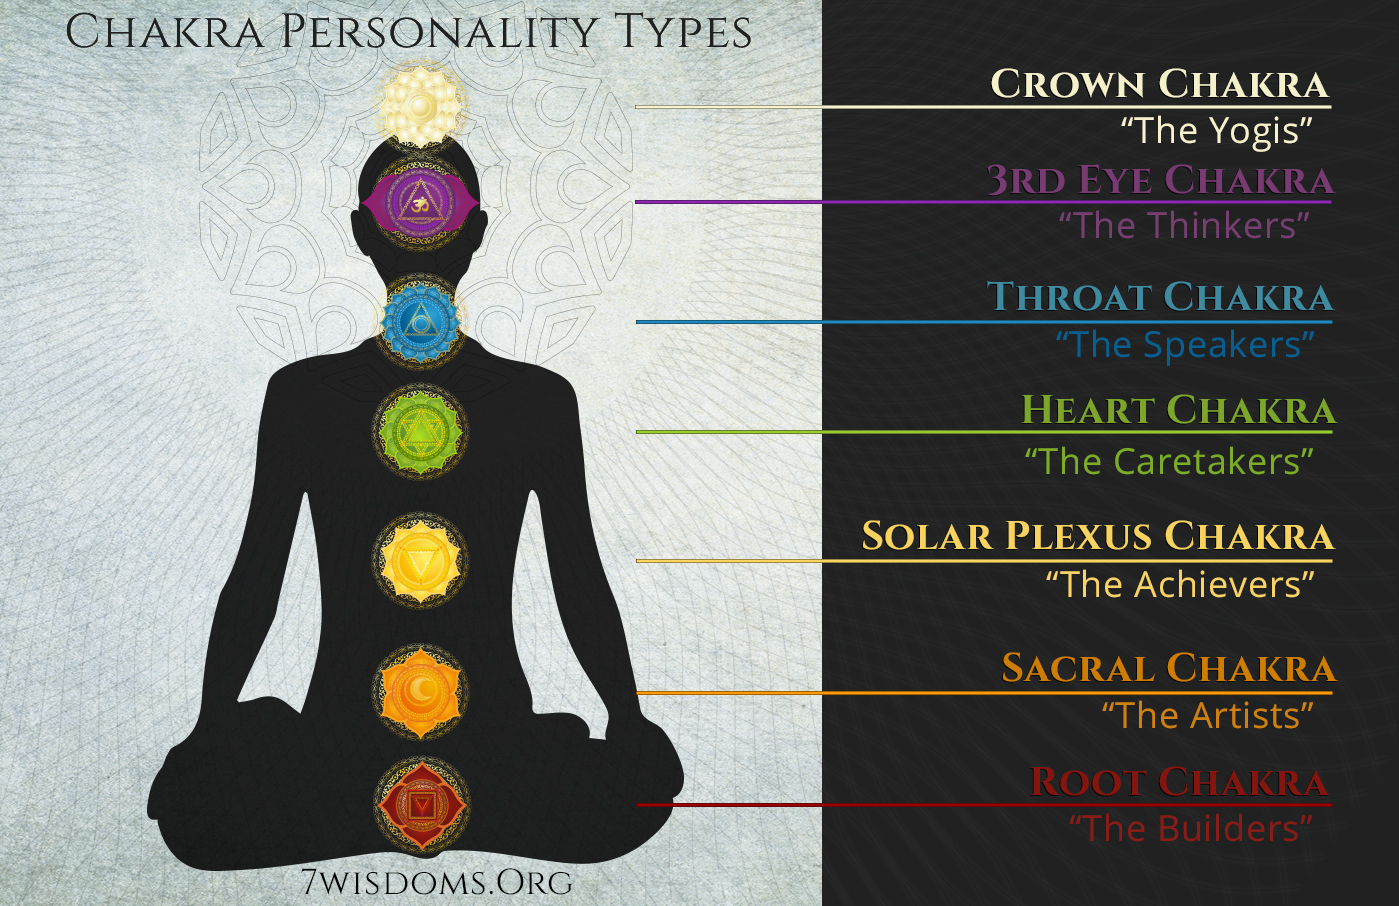 Chakra Personality Types - 7wisdoms org